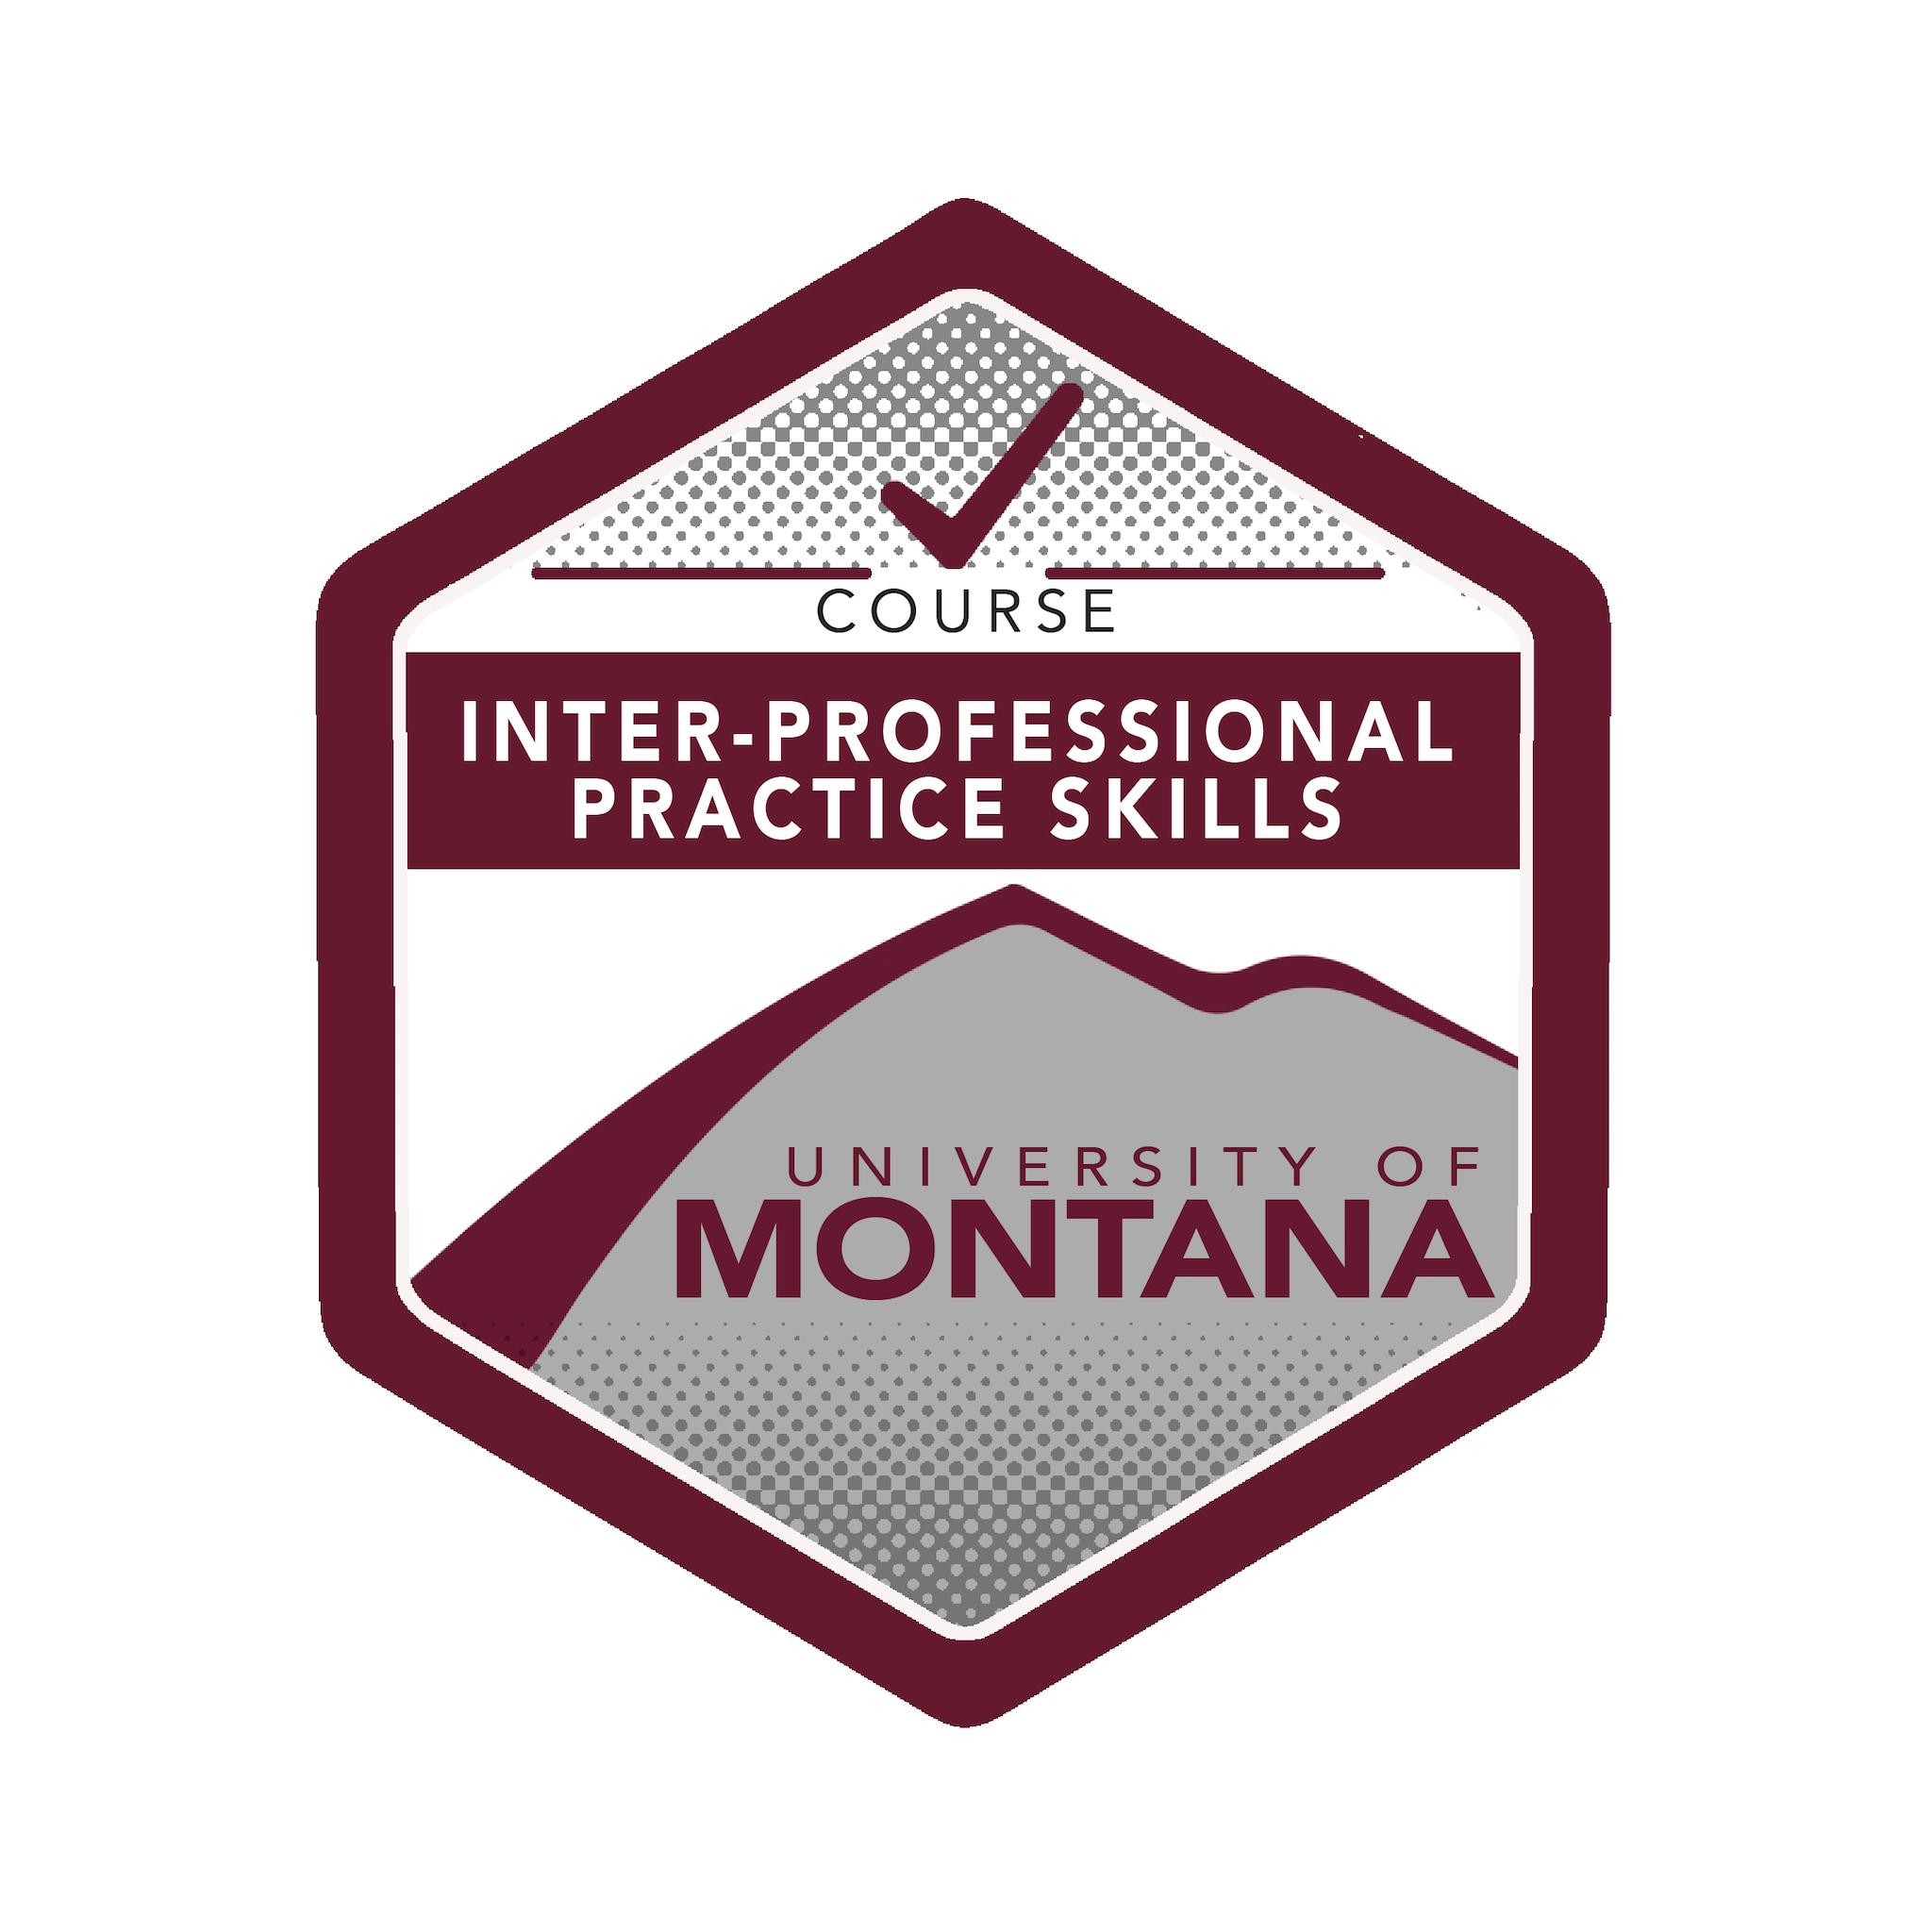 Inter-Professional Practice Skills